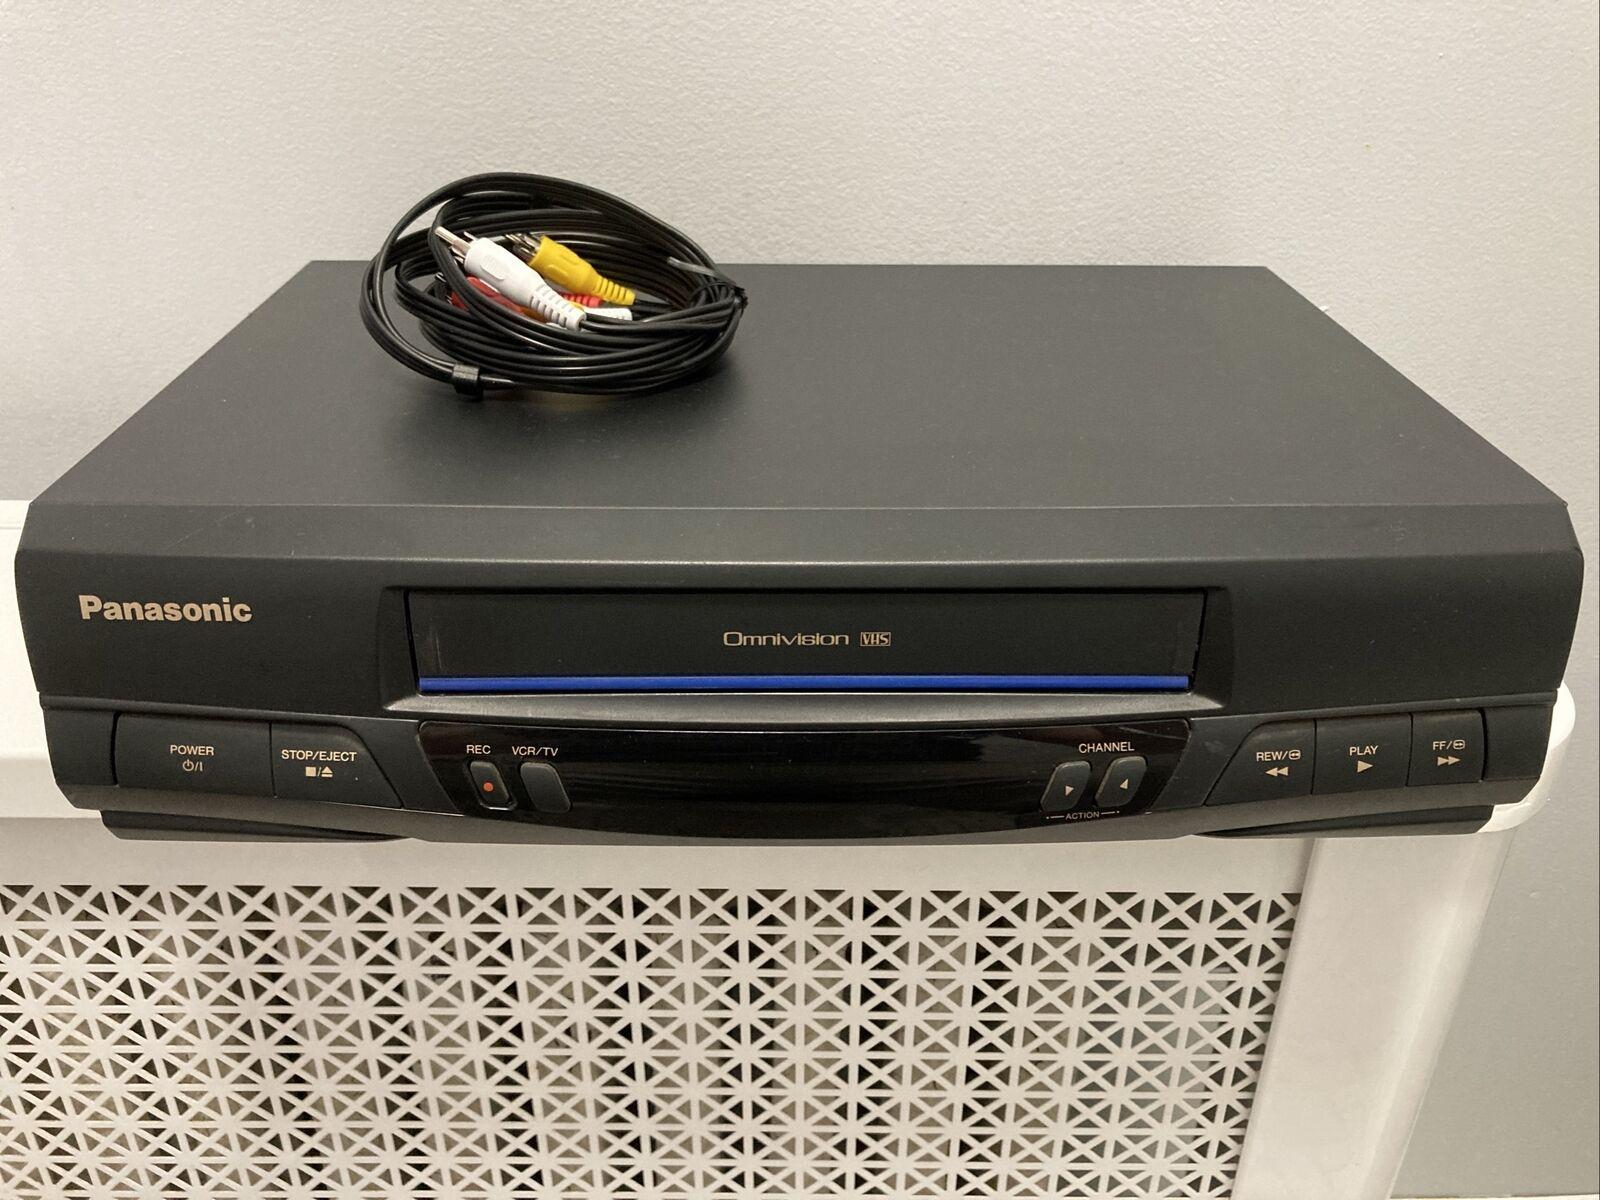 ghdonat.com Panasonic PVQV200 2 Head VCR Electronics Televisions ...